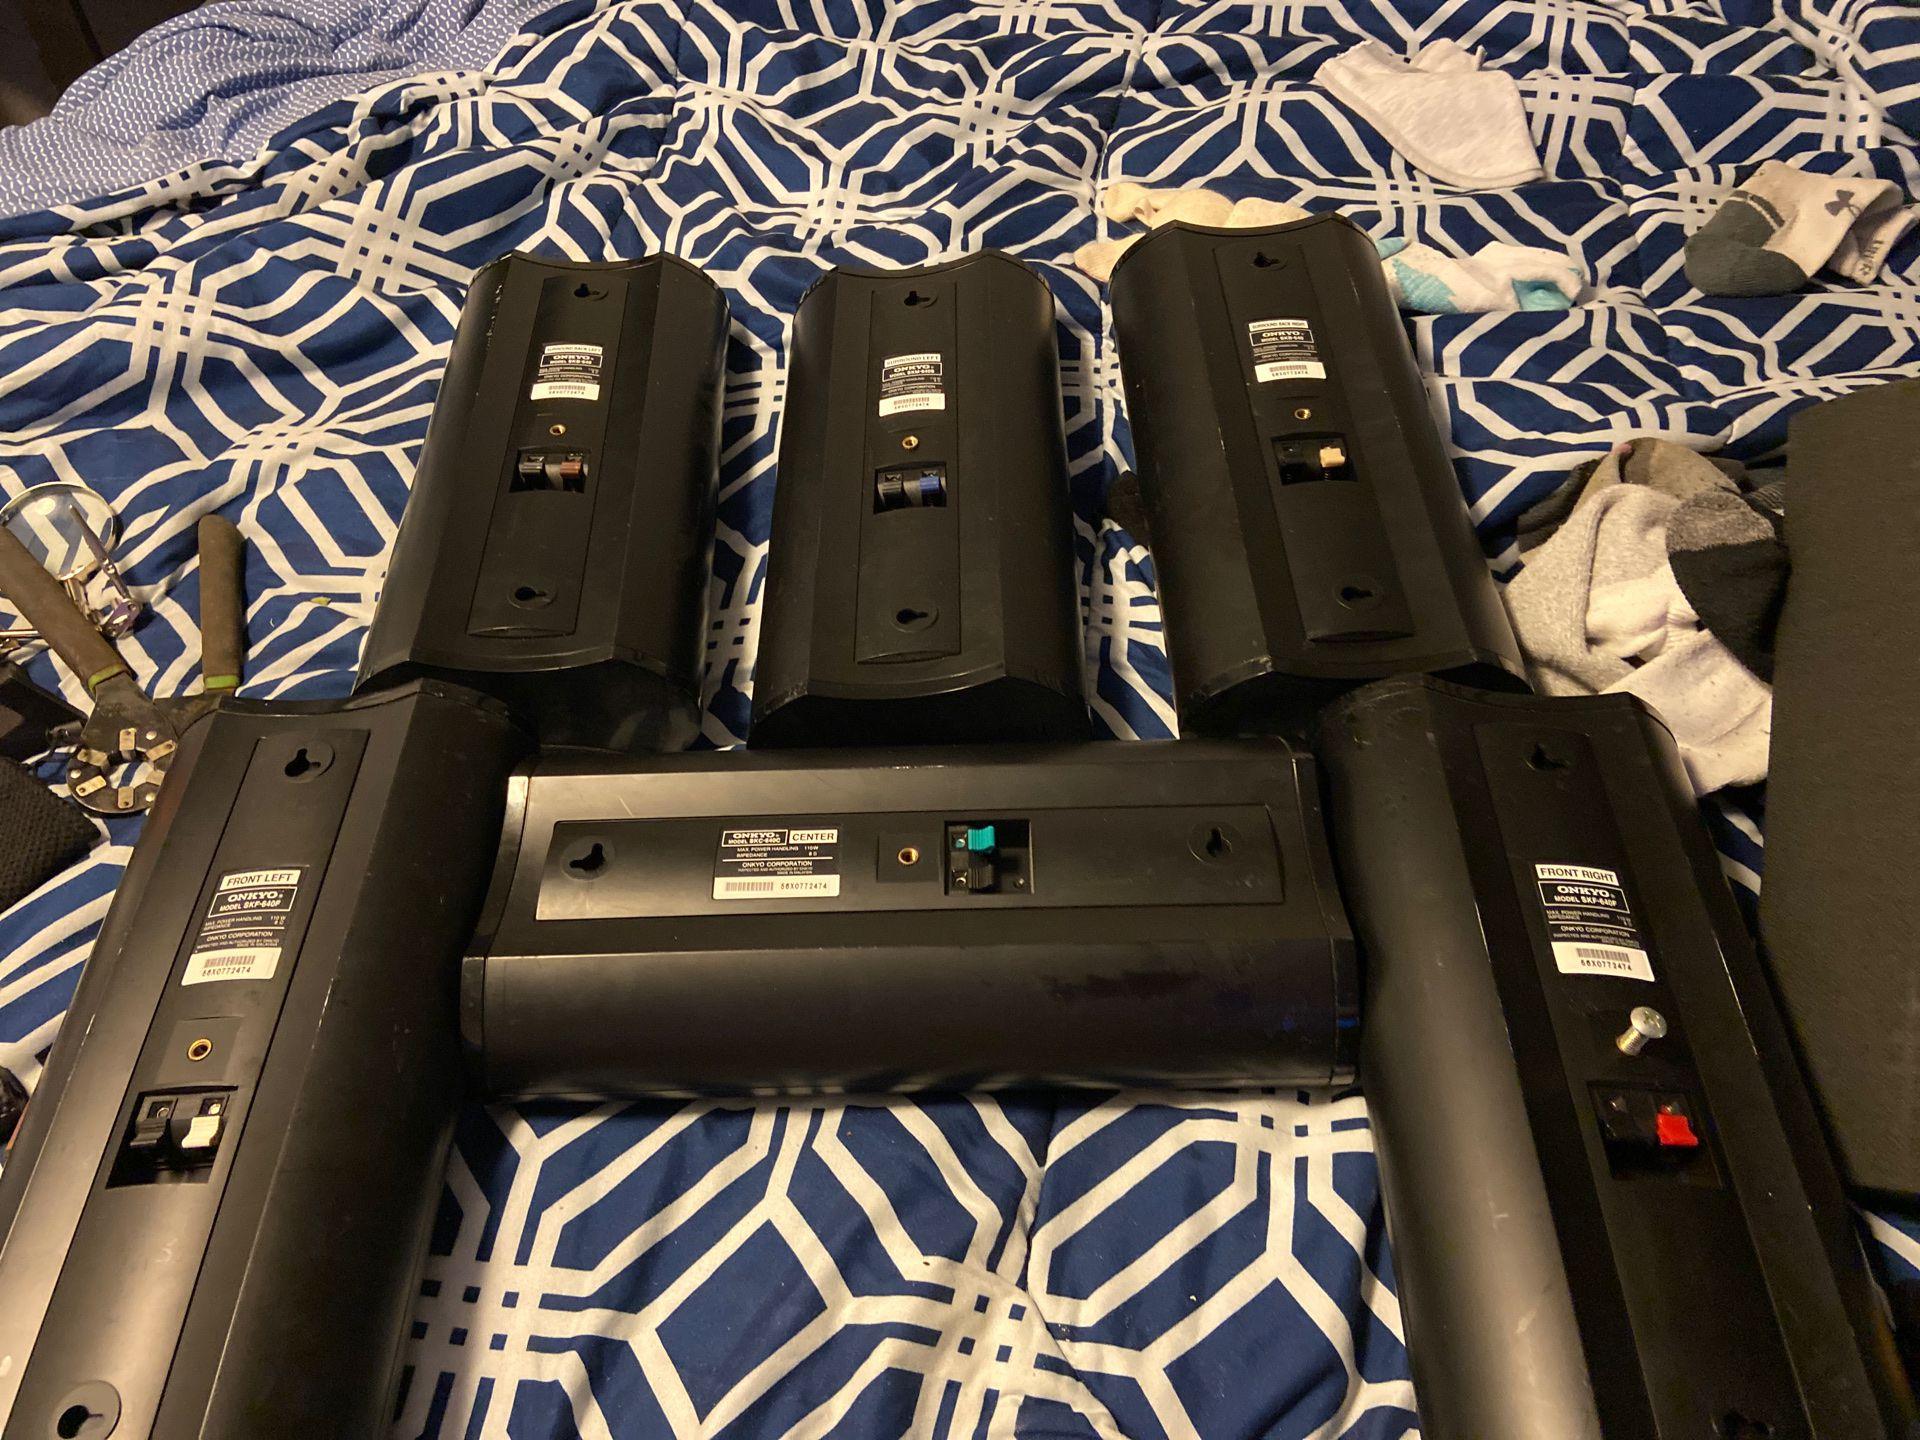 Ok yo model slc-640c surround sound 110w